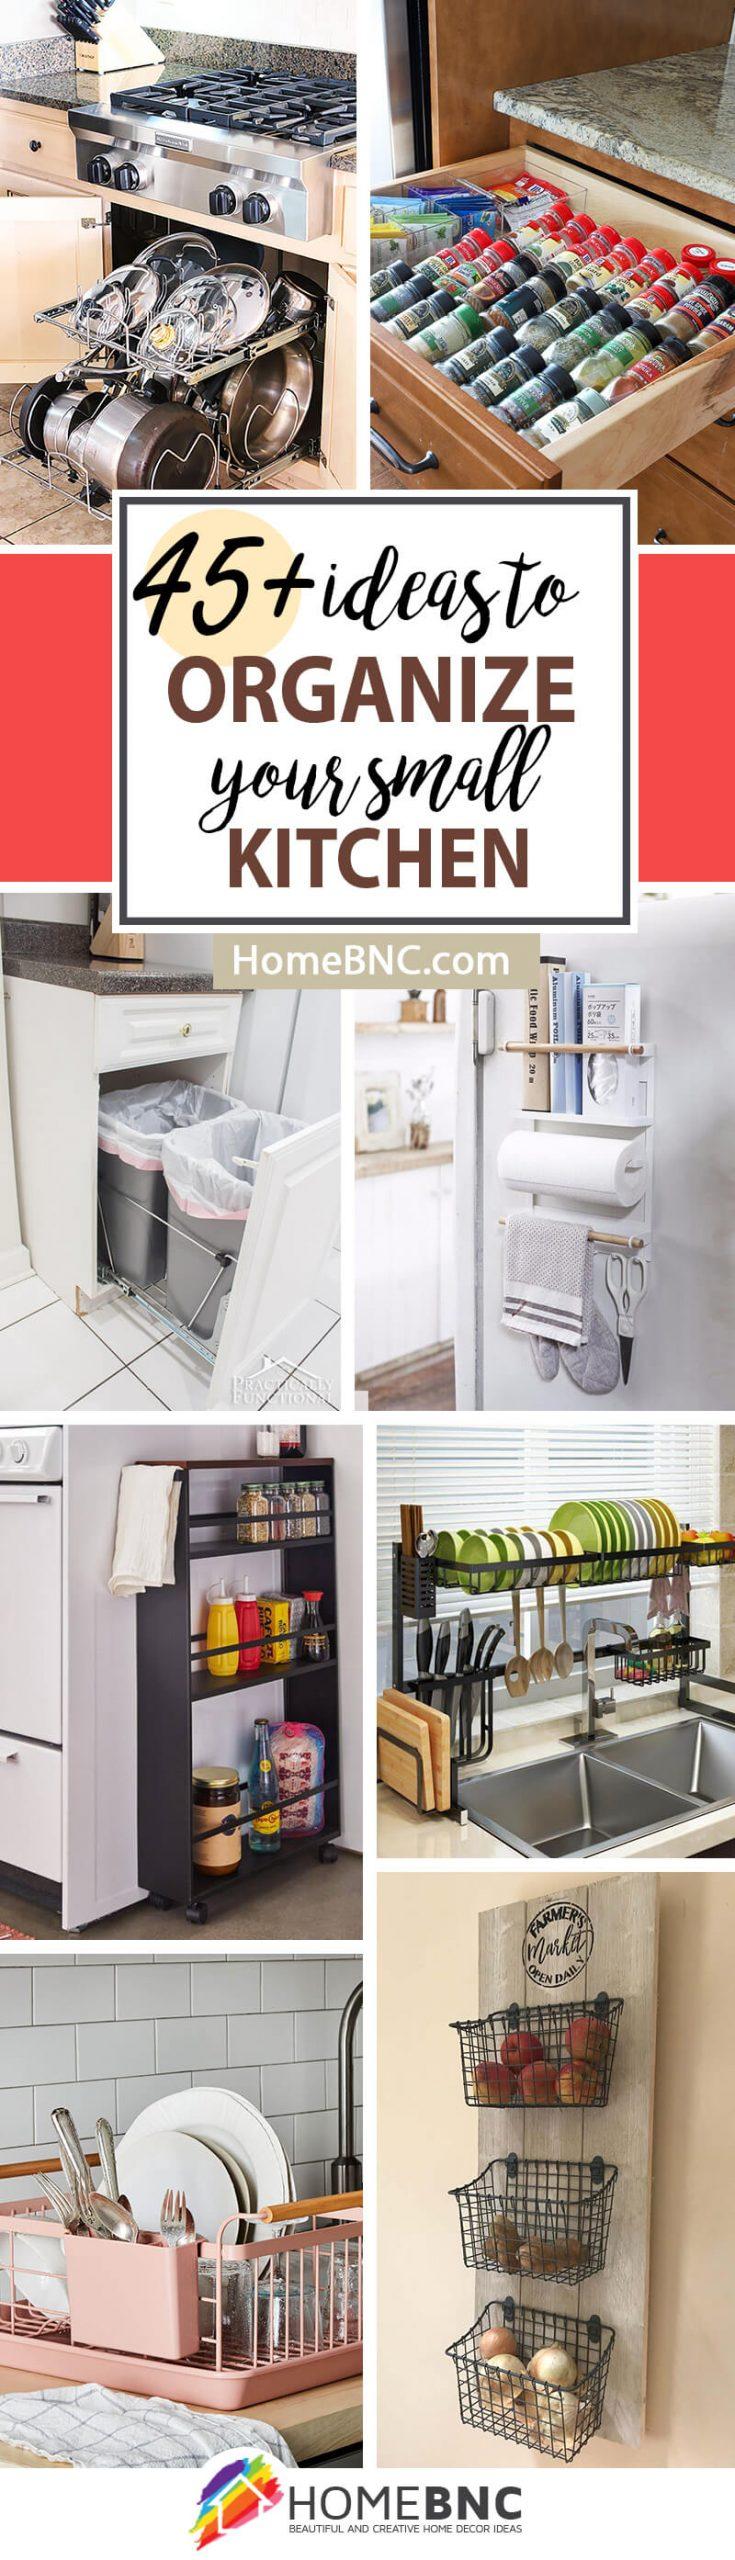 45 Best Small Kitchen Storage Organization Ideas And Designs For 2021